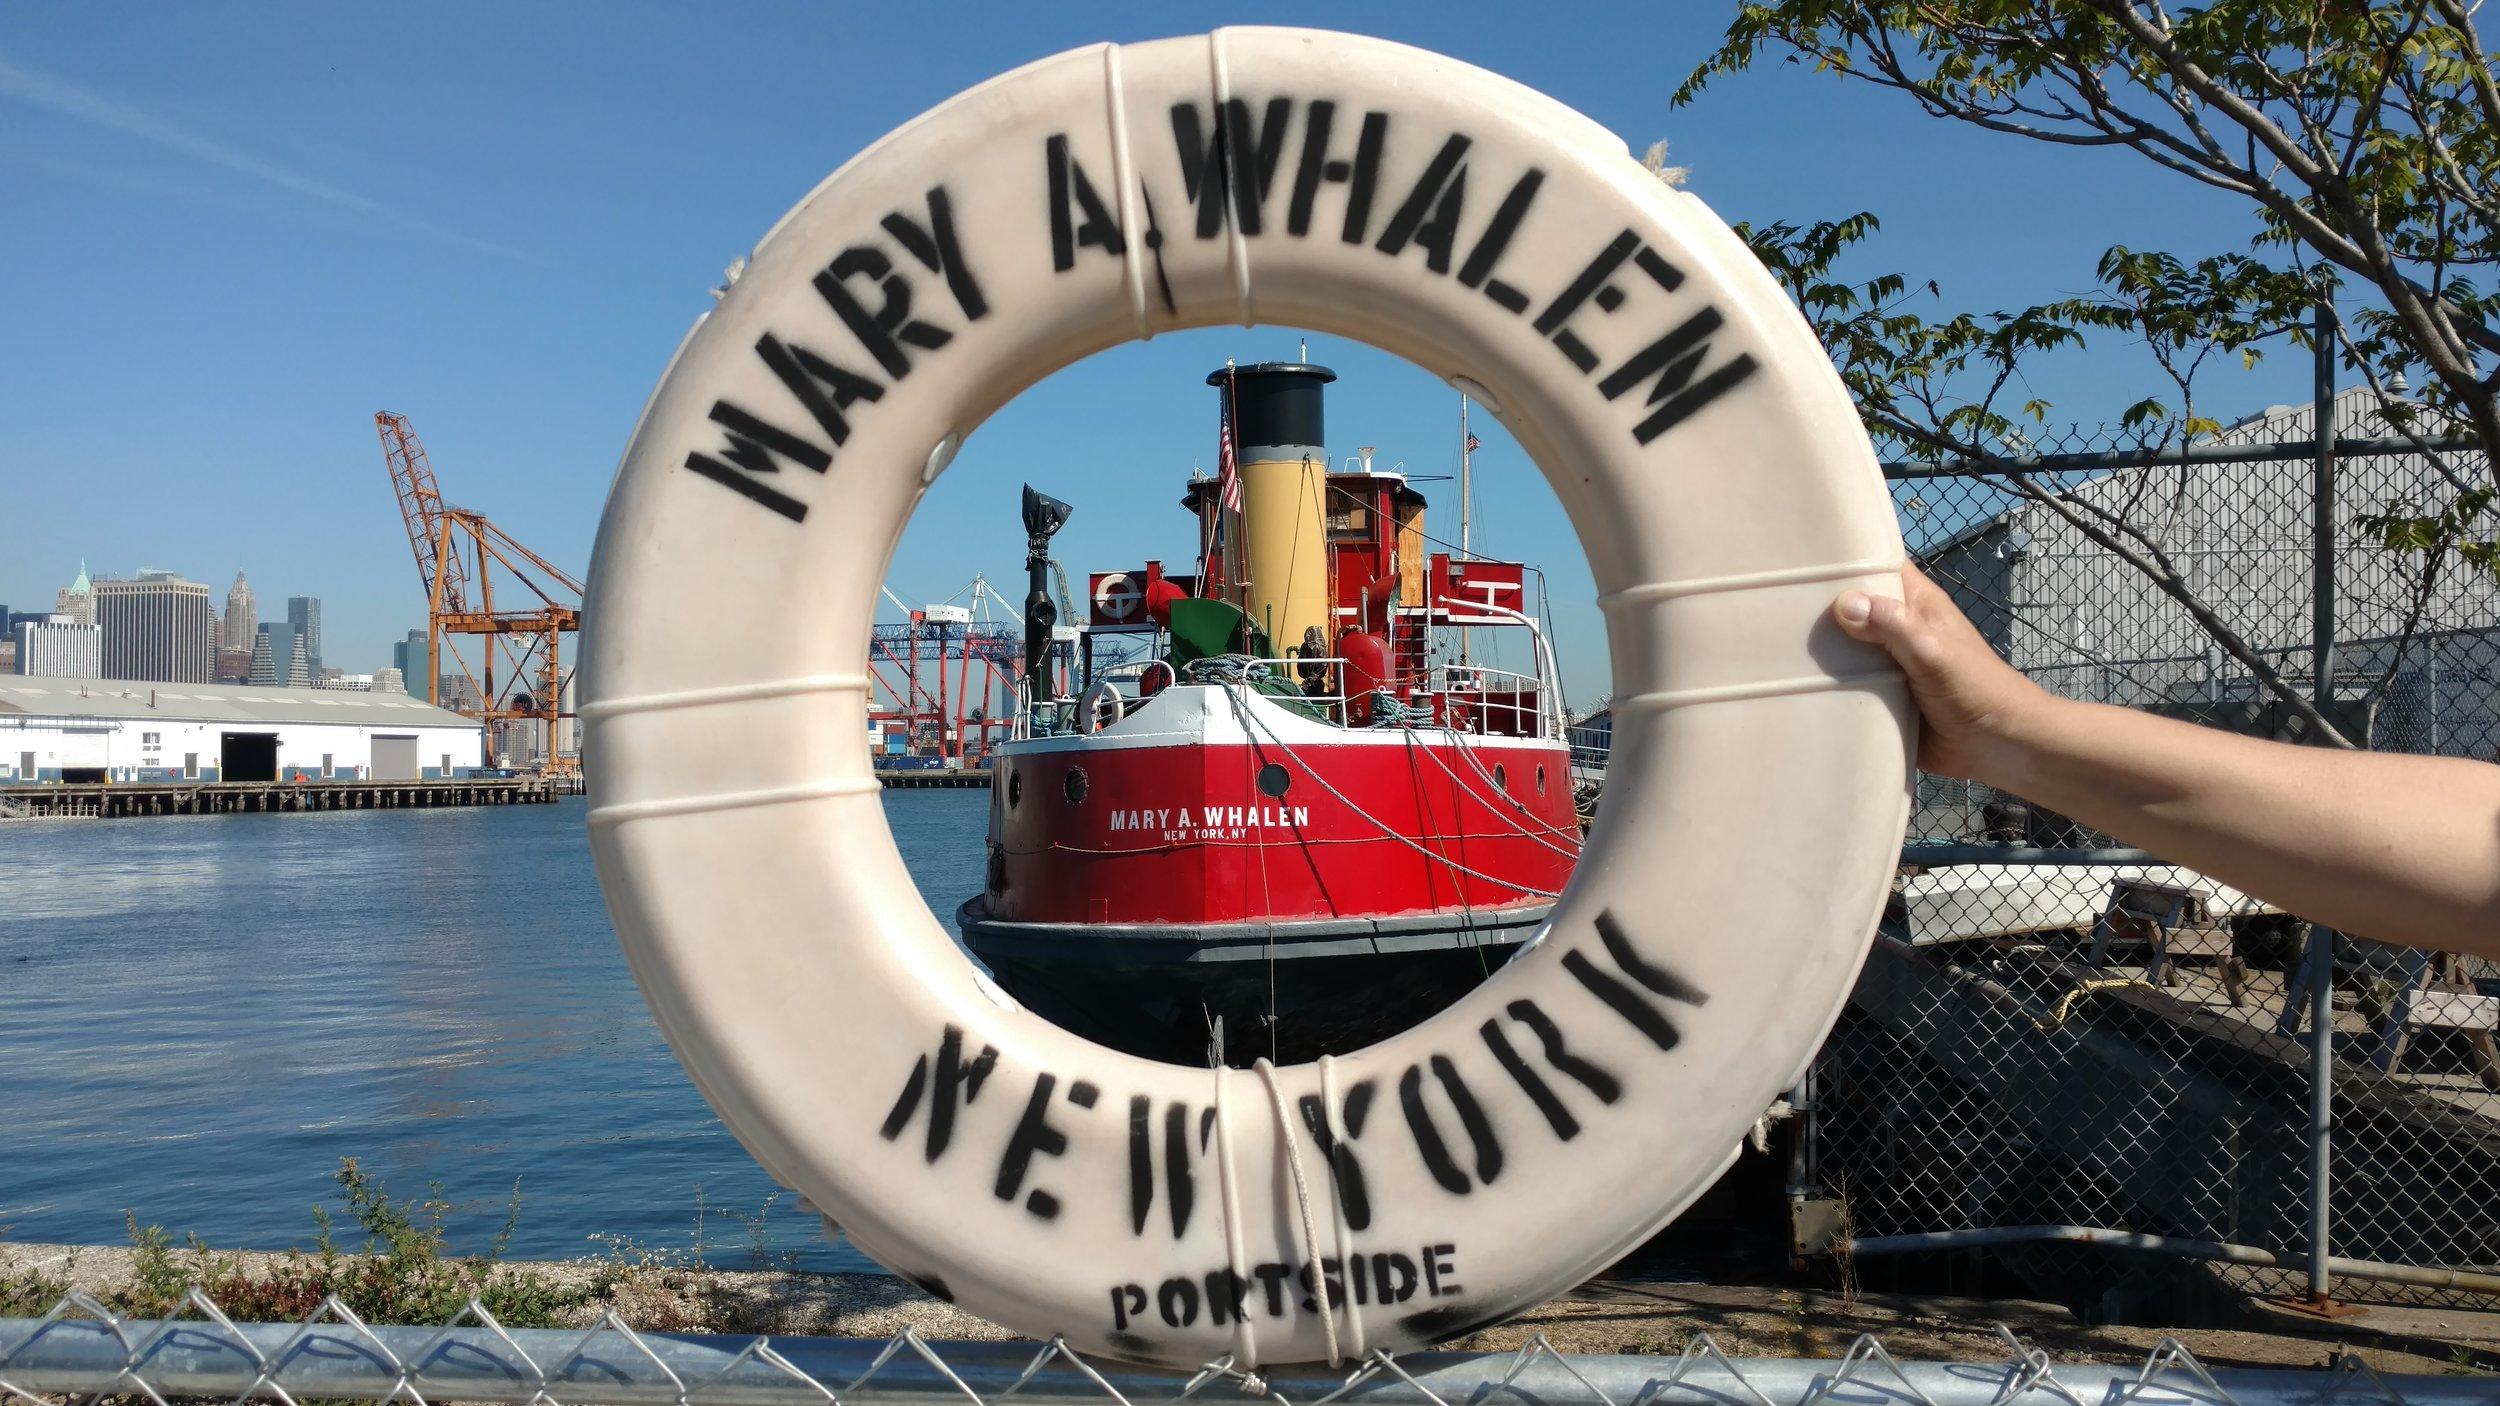 PortSide NewYork